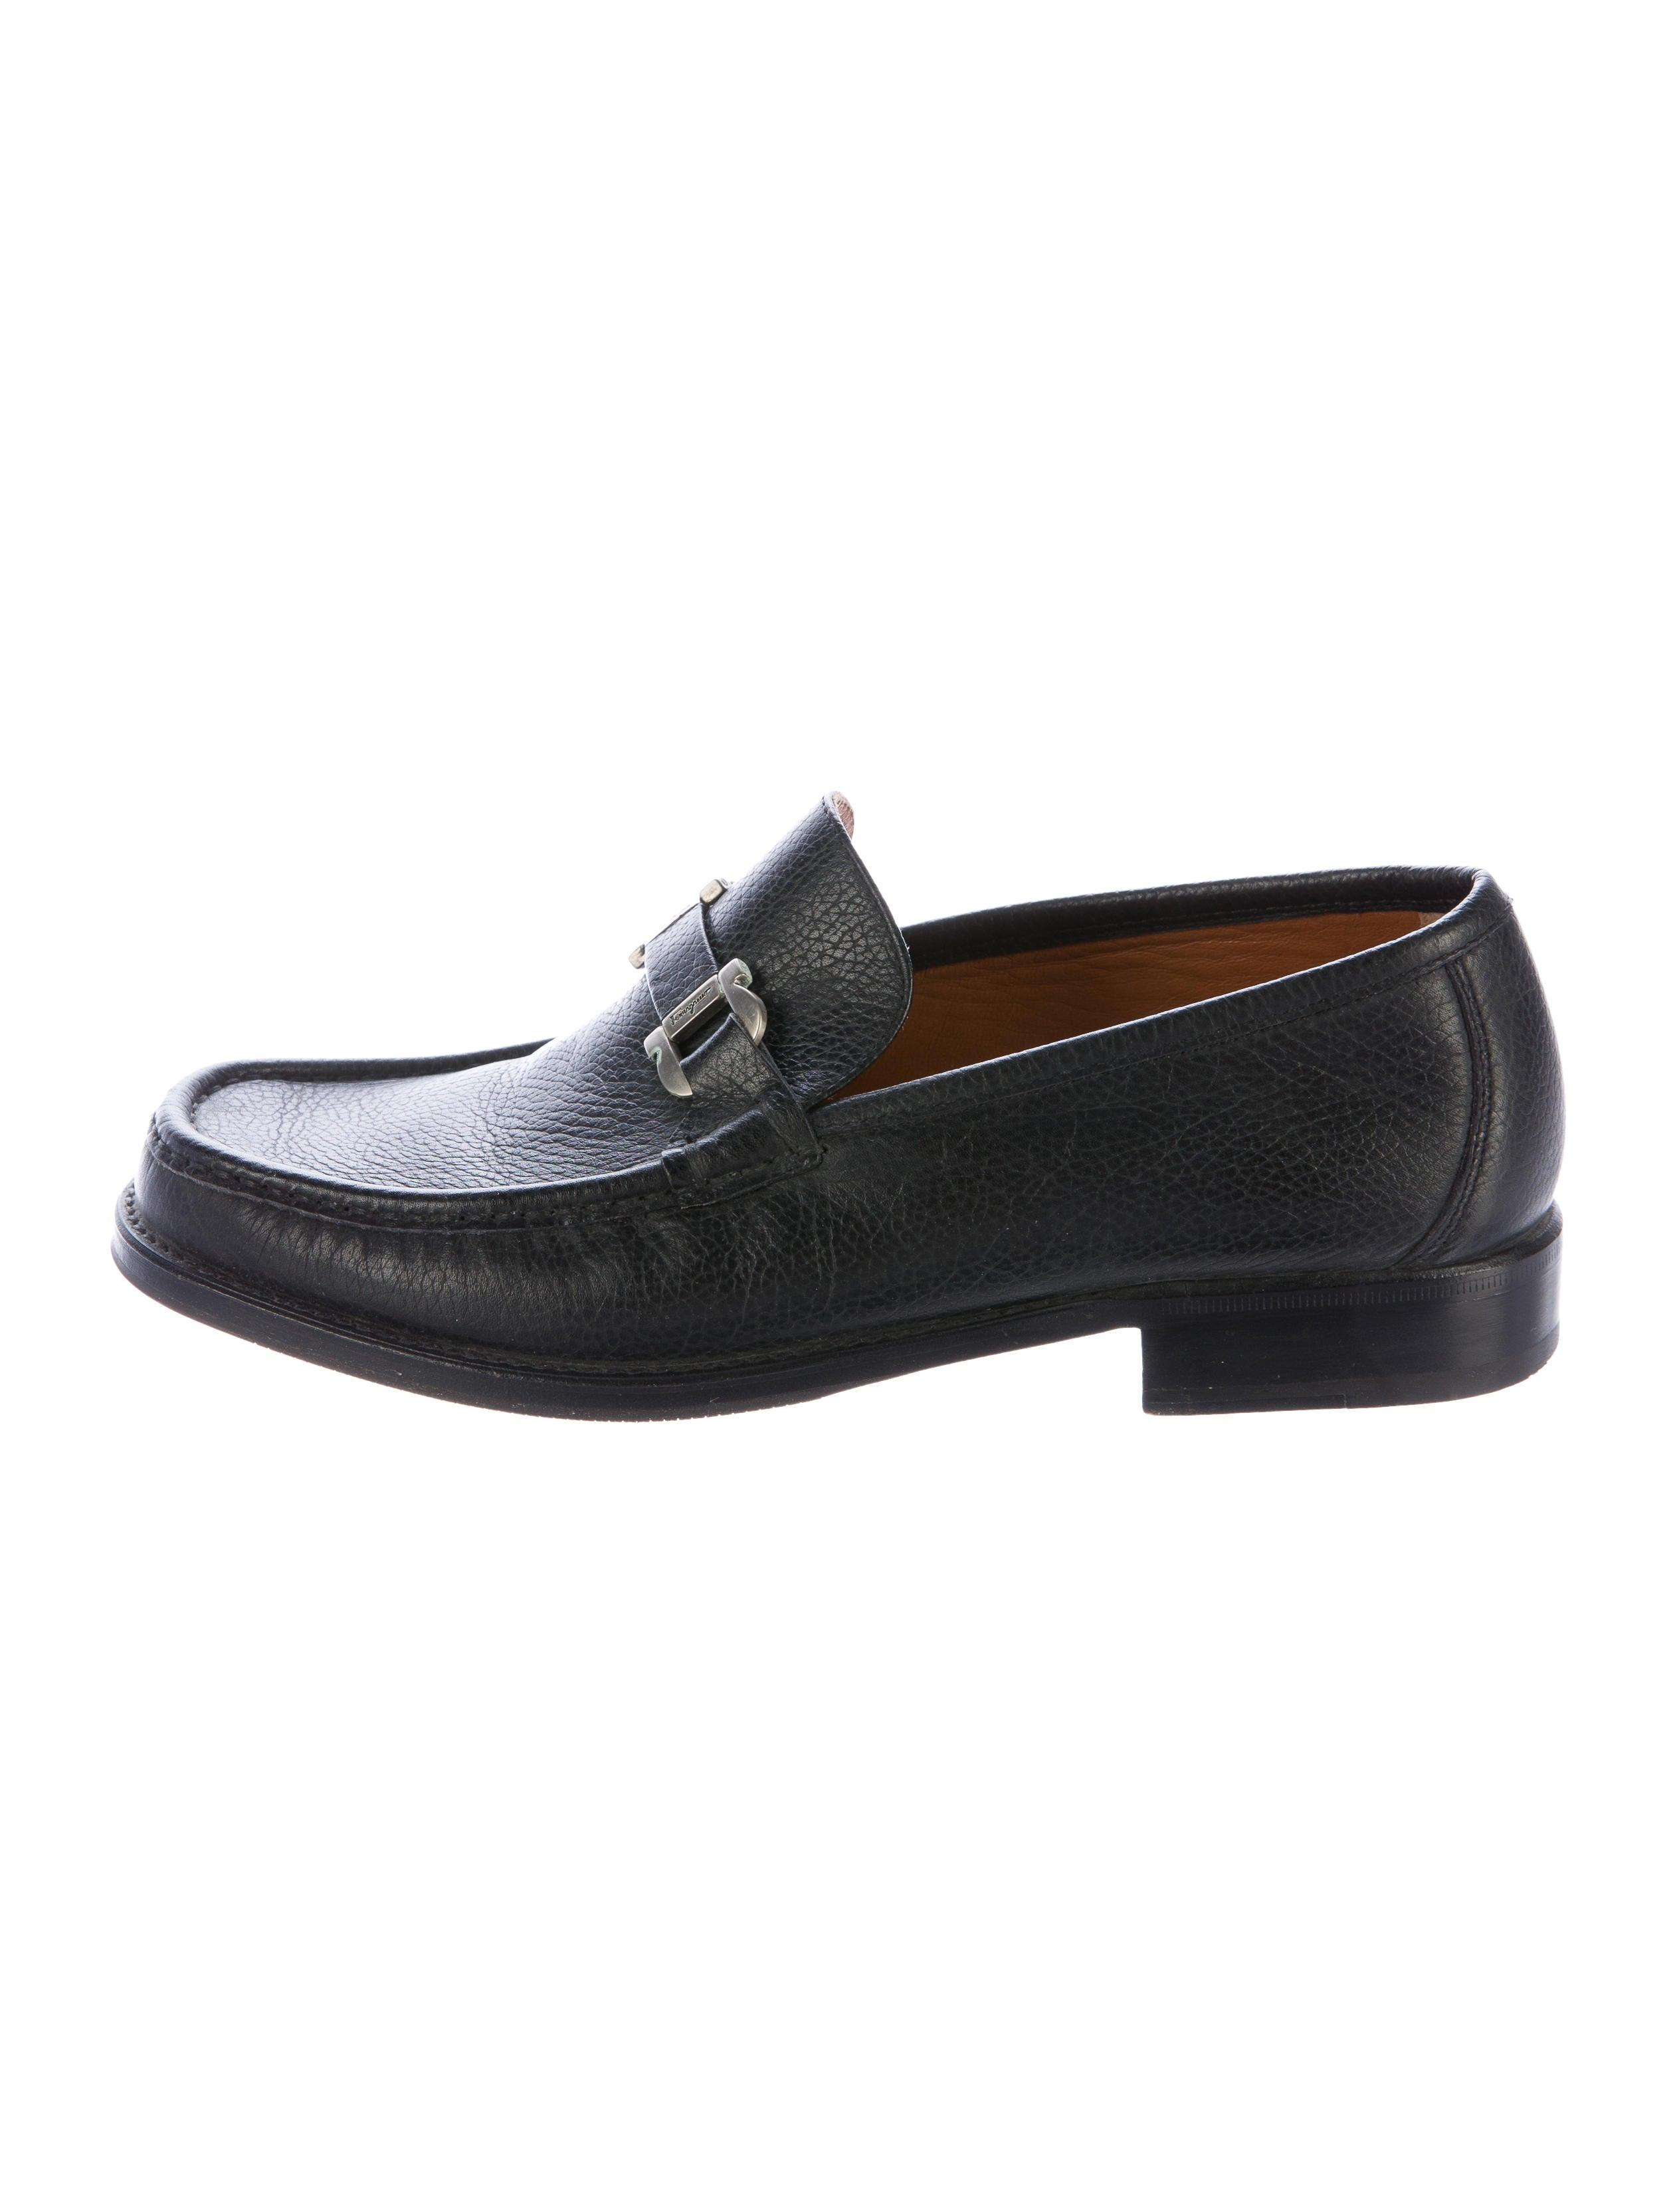 salvatore ferragamo gancio dress loafers shoes